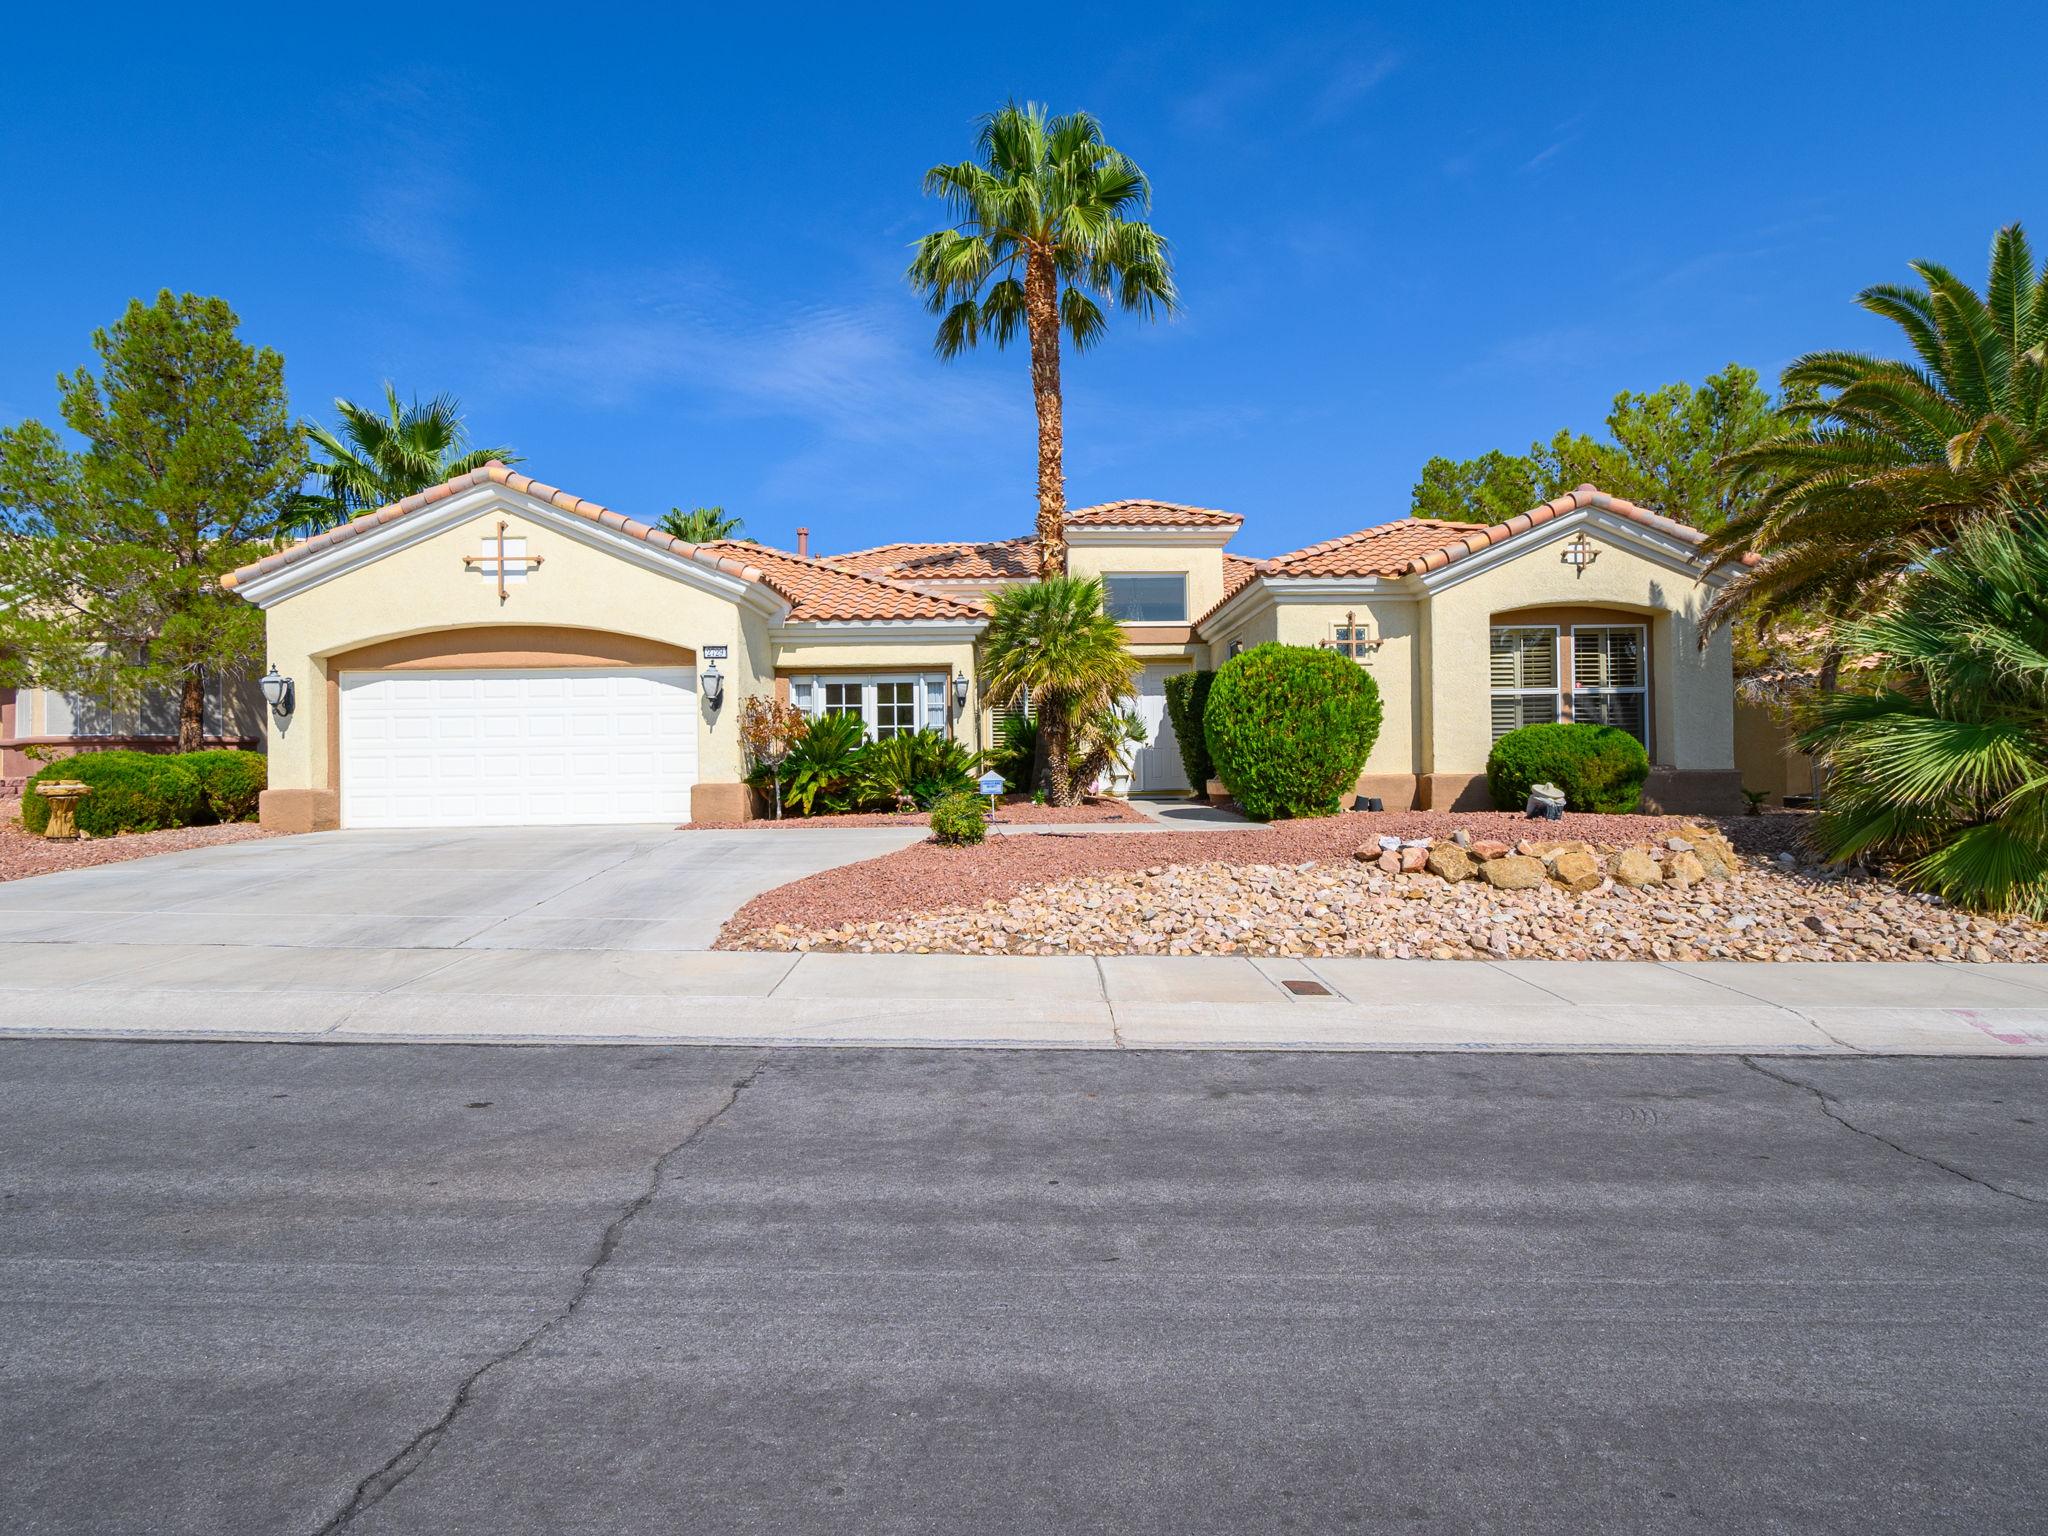 2729 Youngdale Dr, Las Vegas, NV 89134, USA Photo 1